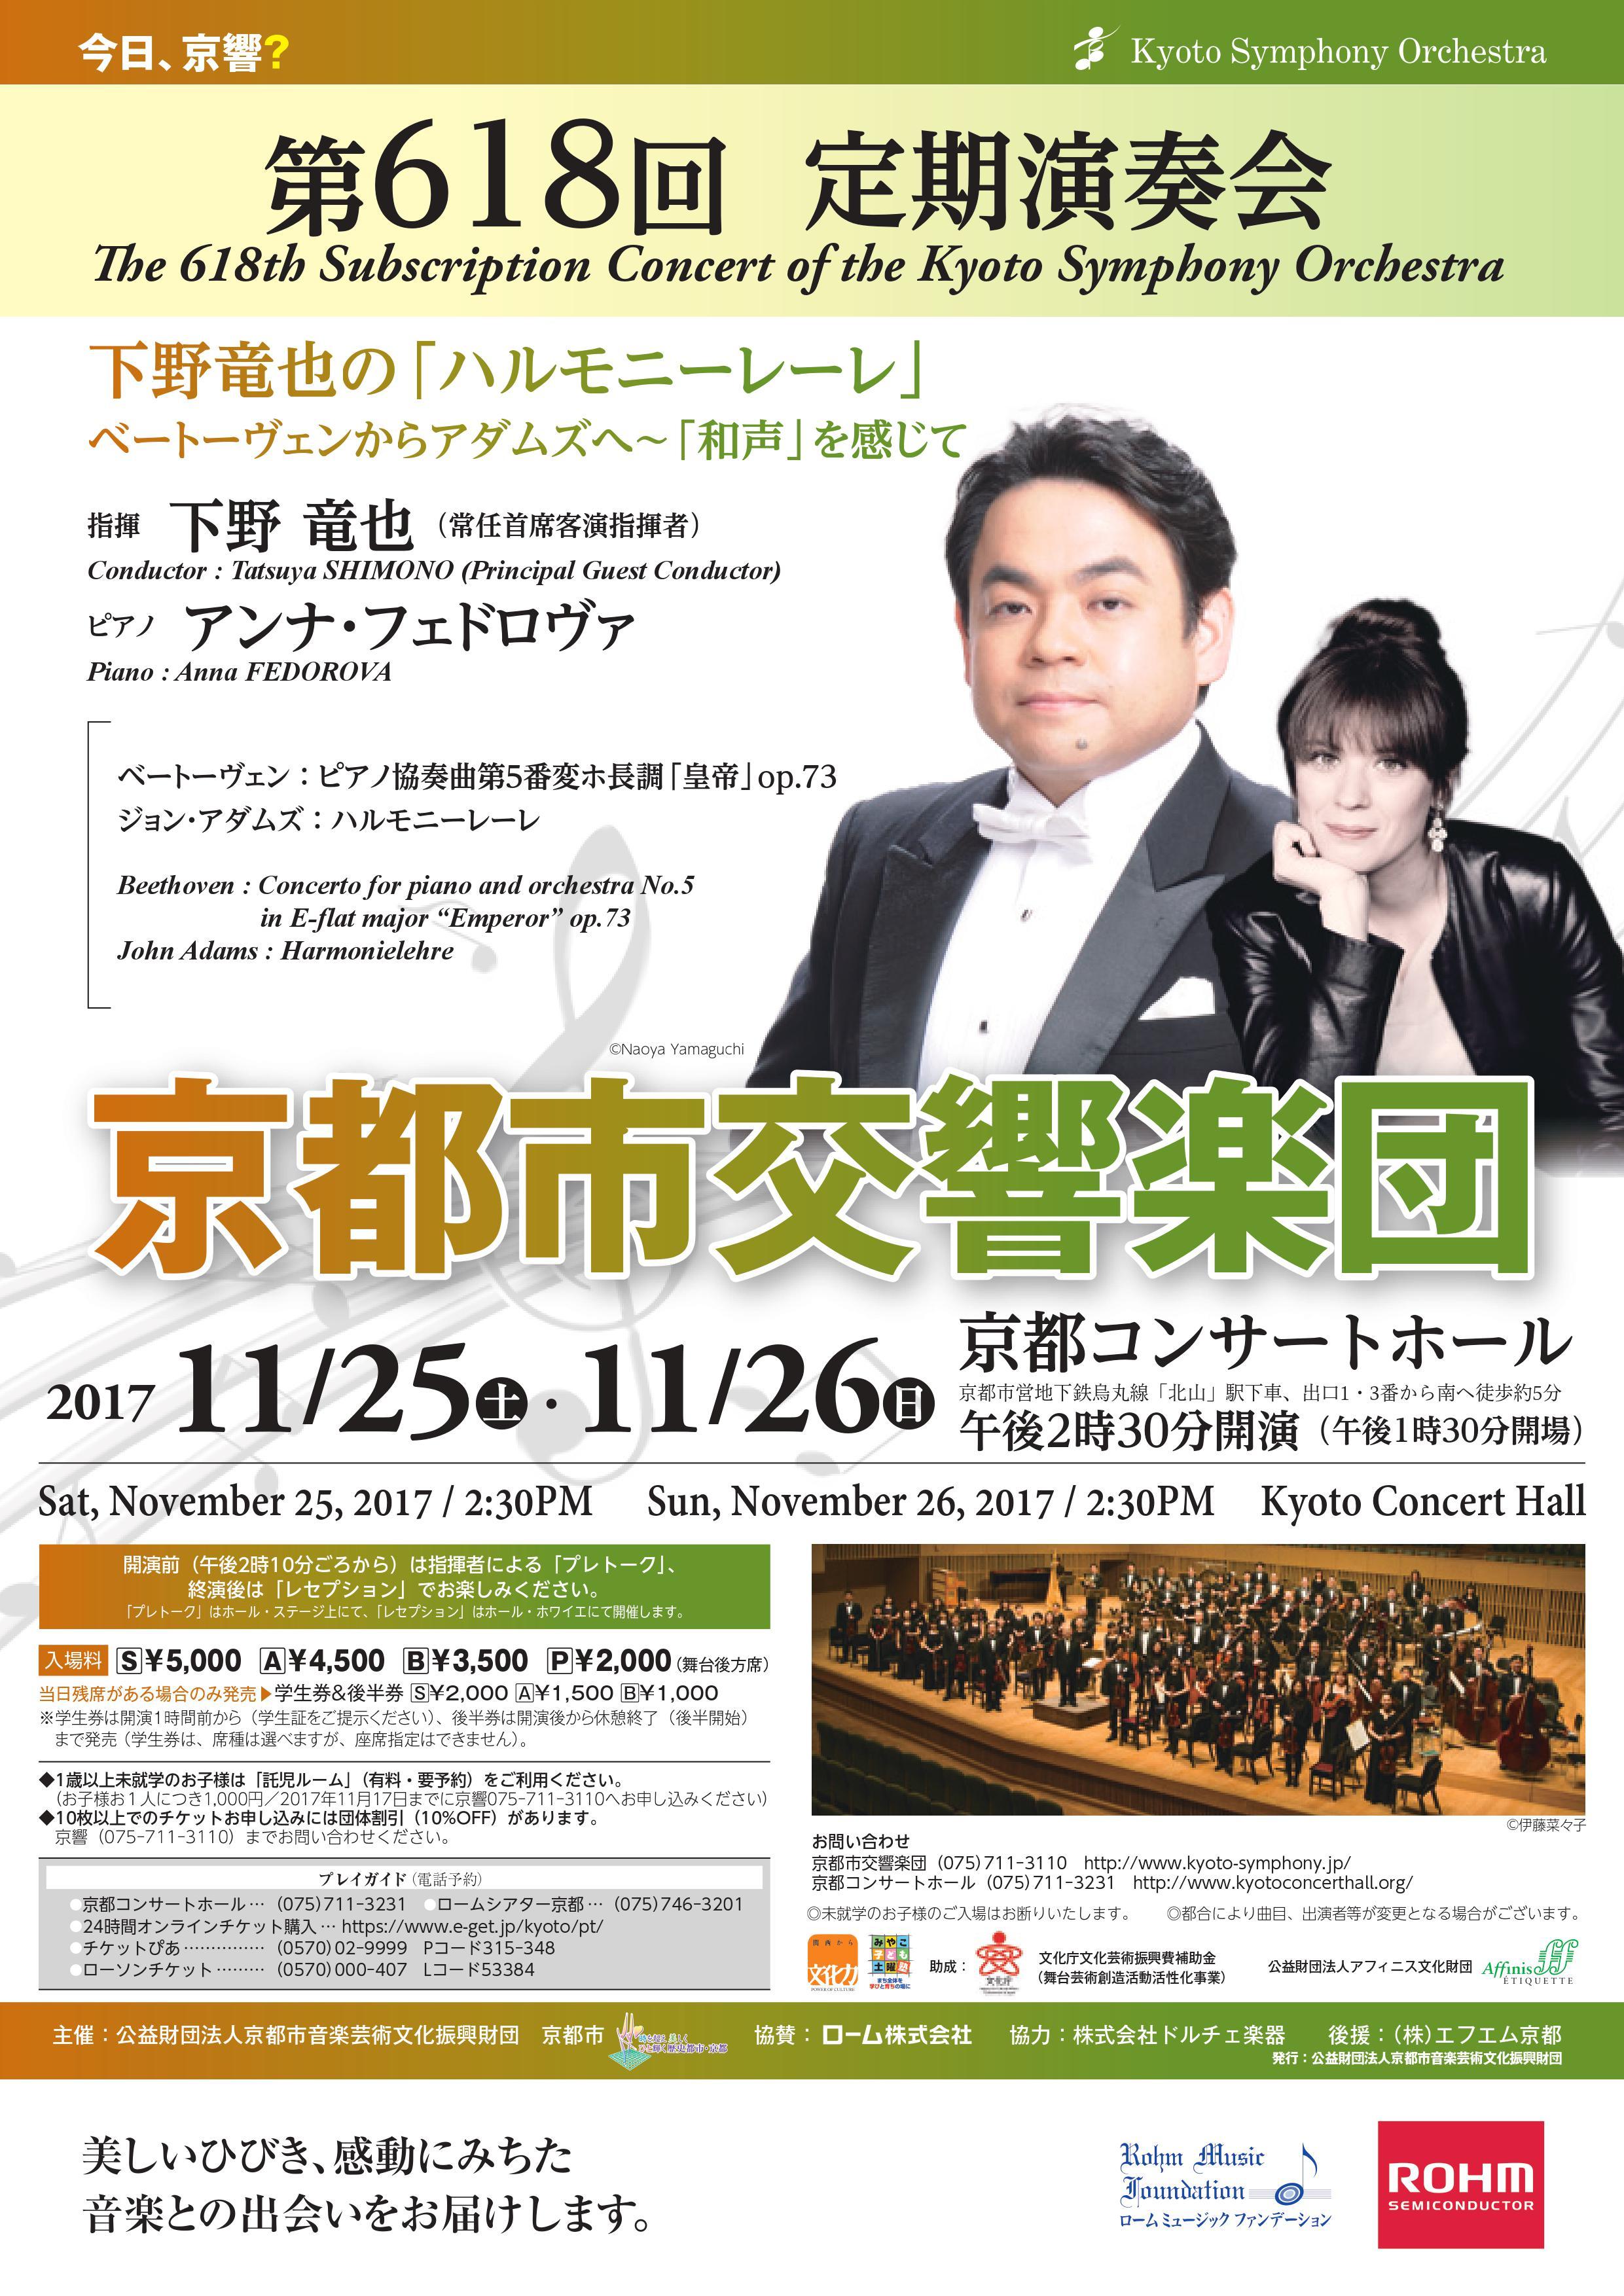 This week's concert (20 November – 26 November, 2017)